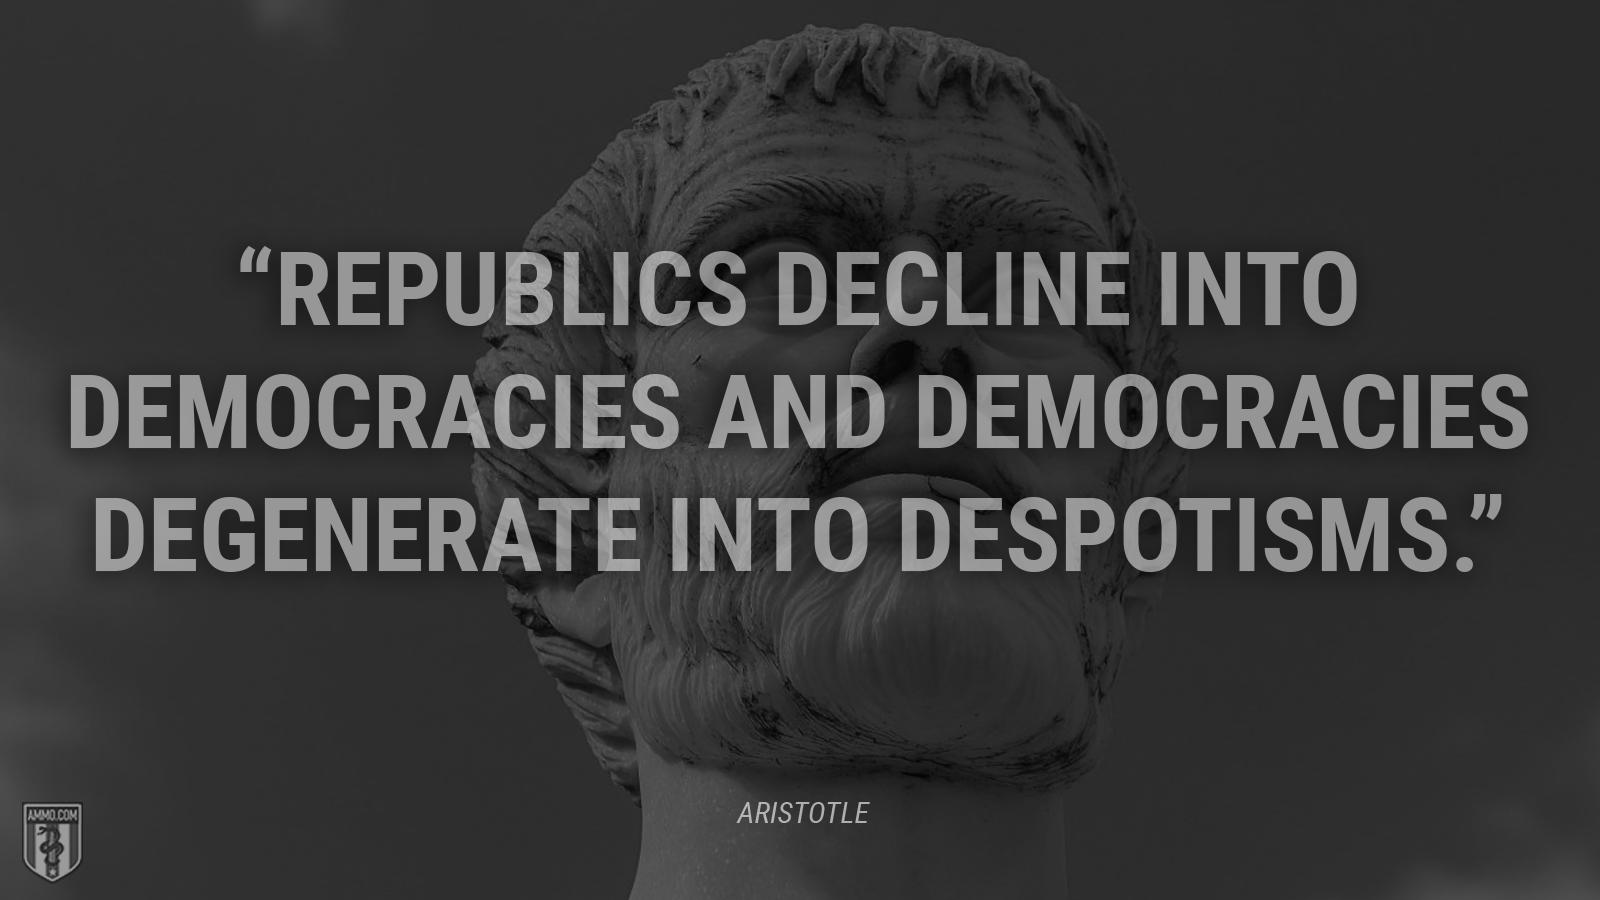 """Republics decline into democracies and democracies degenerate into despotisms."" - Aristotle"